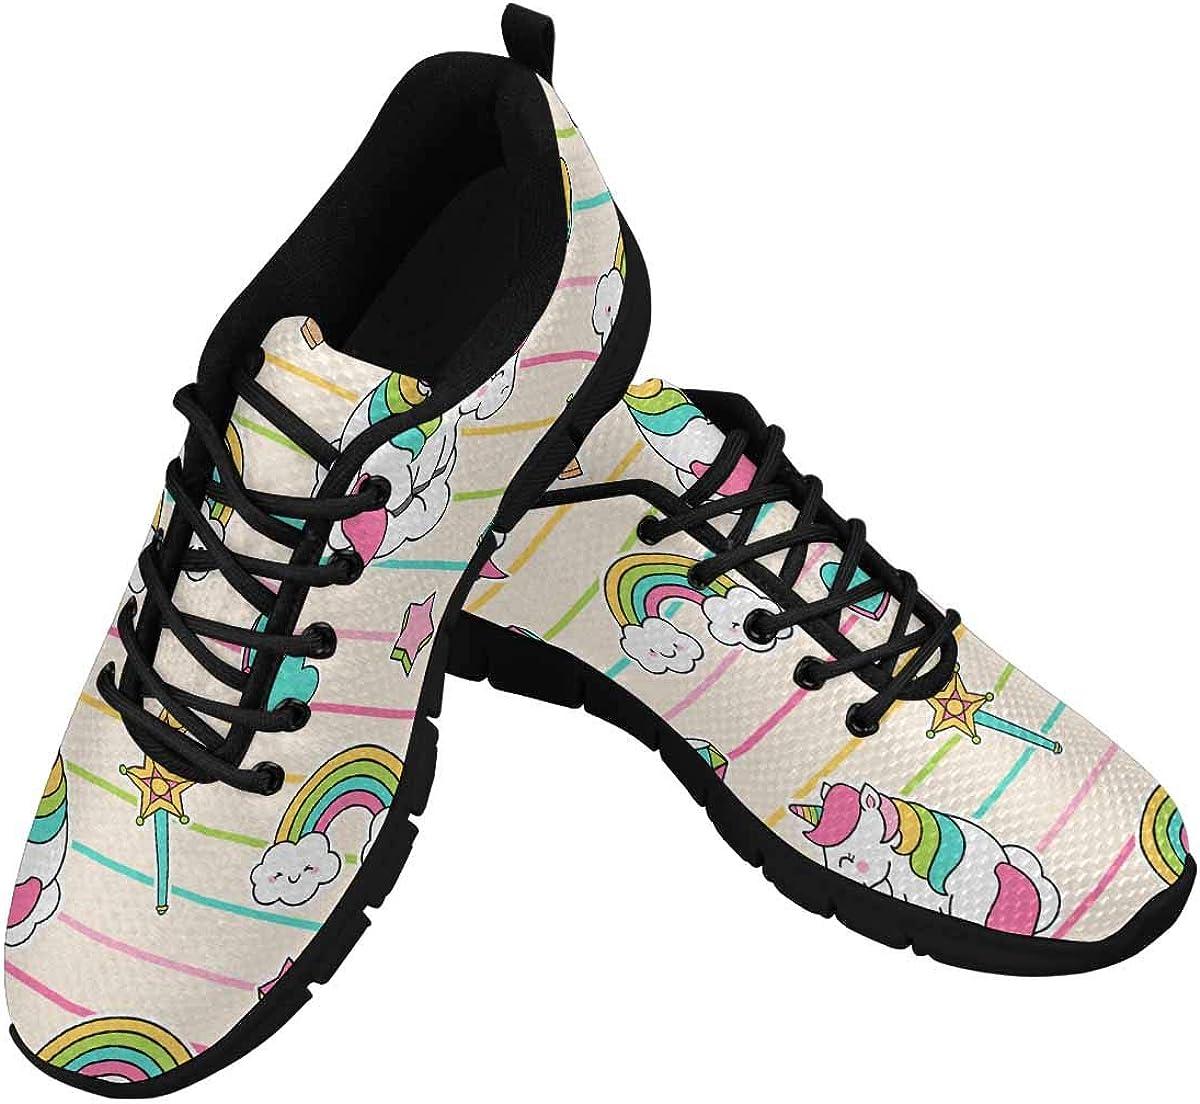 InterestPrint Unicorn, Rainbow, Ice Cream Women's Walking Shoes Lightweight Casual Running Sneakers